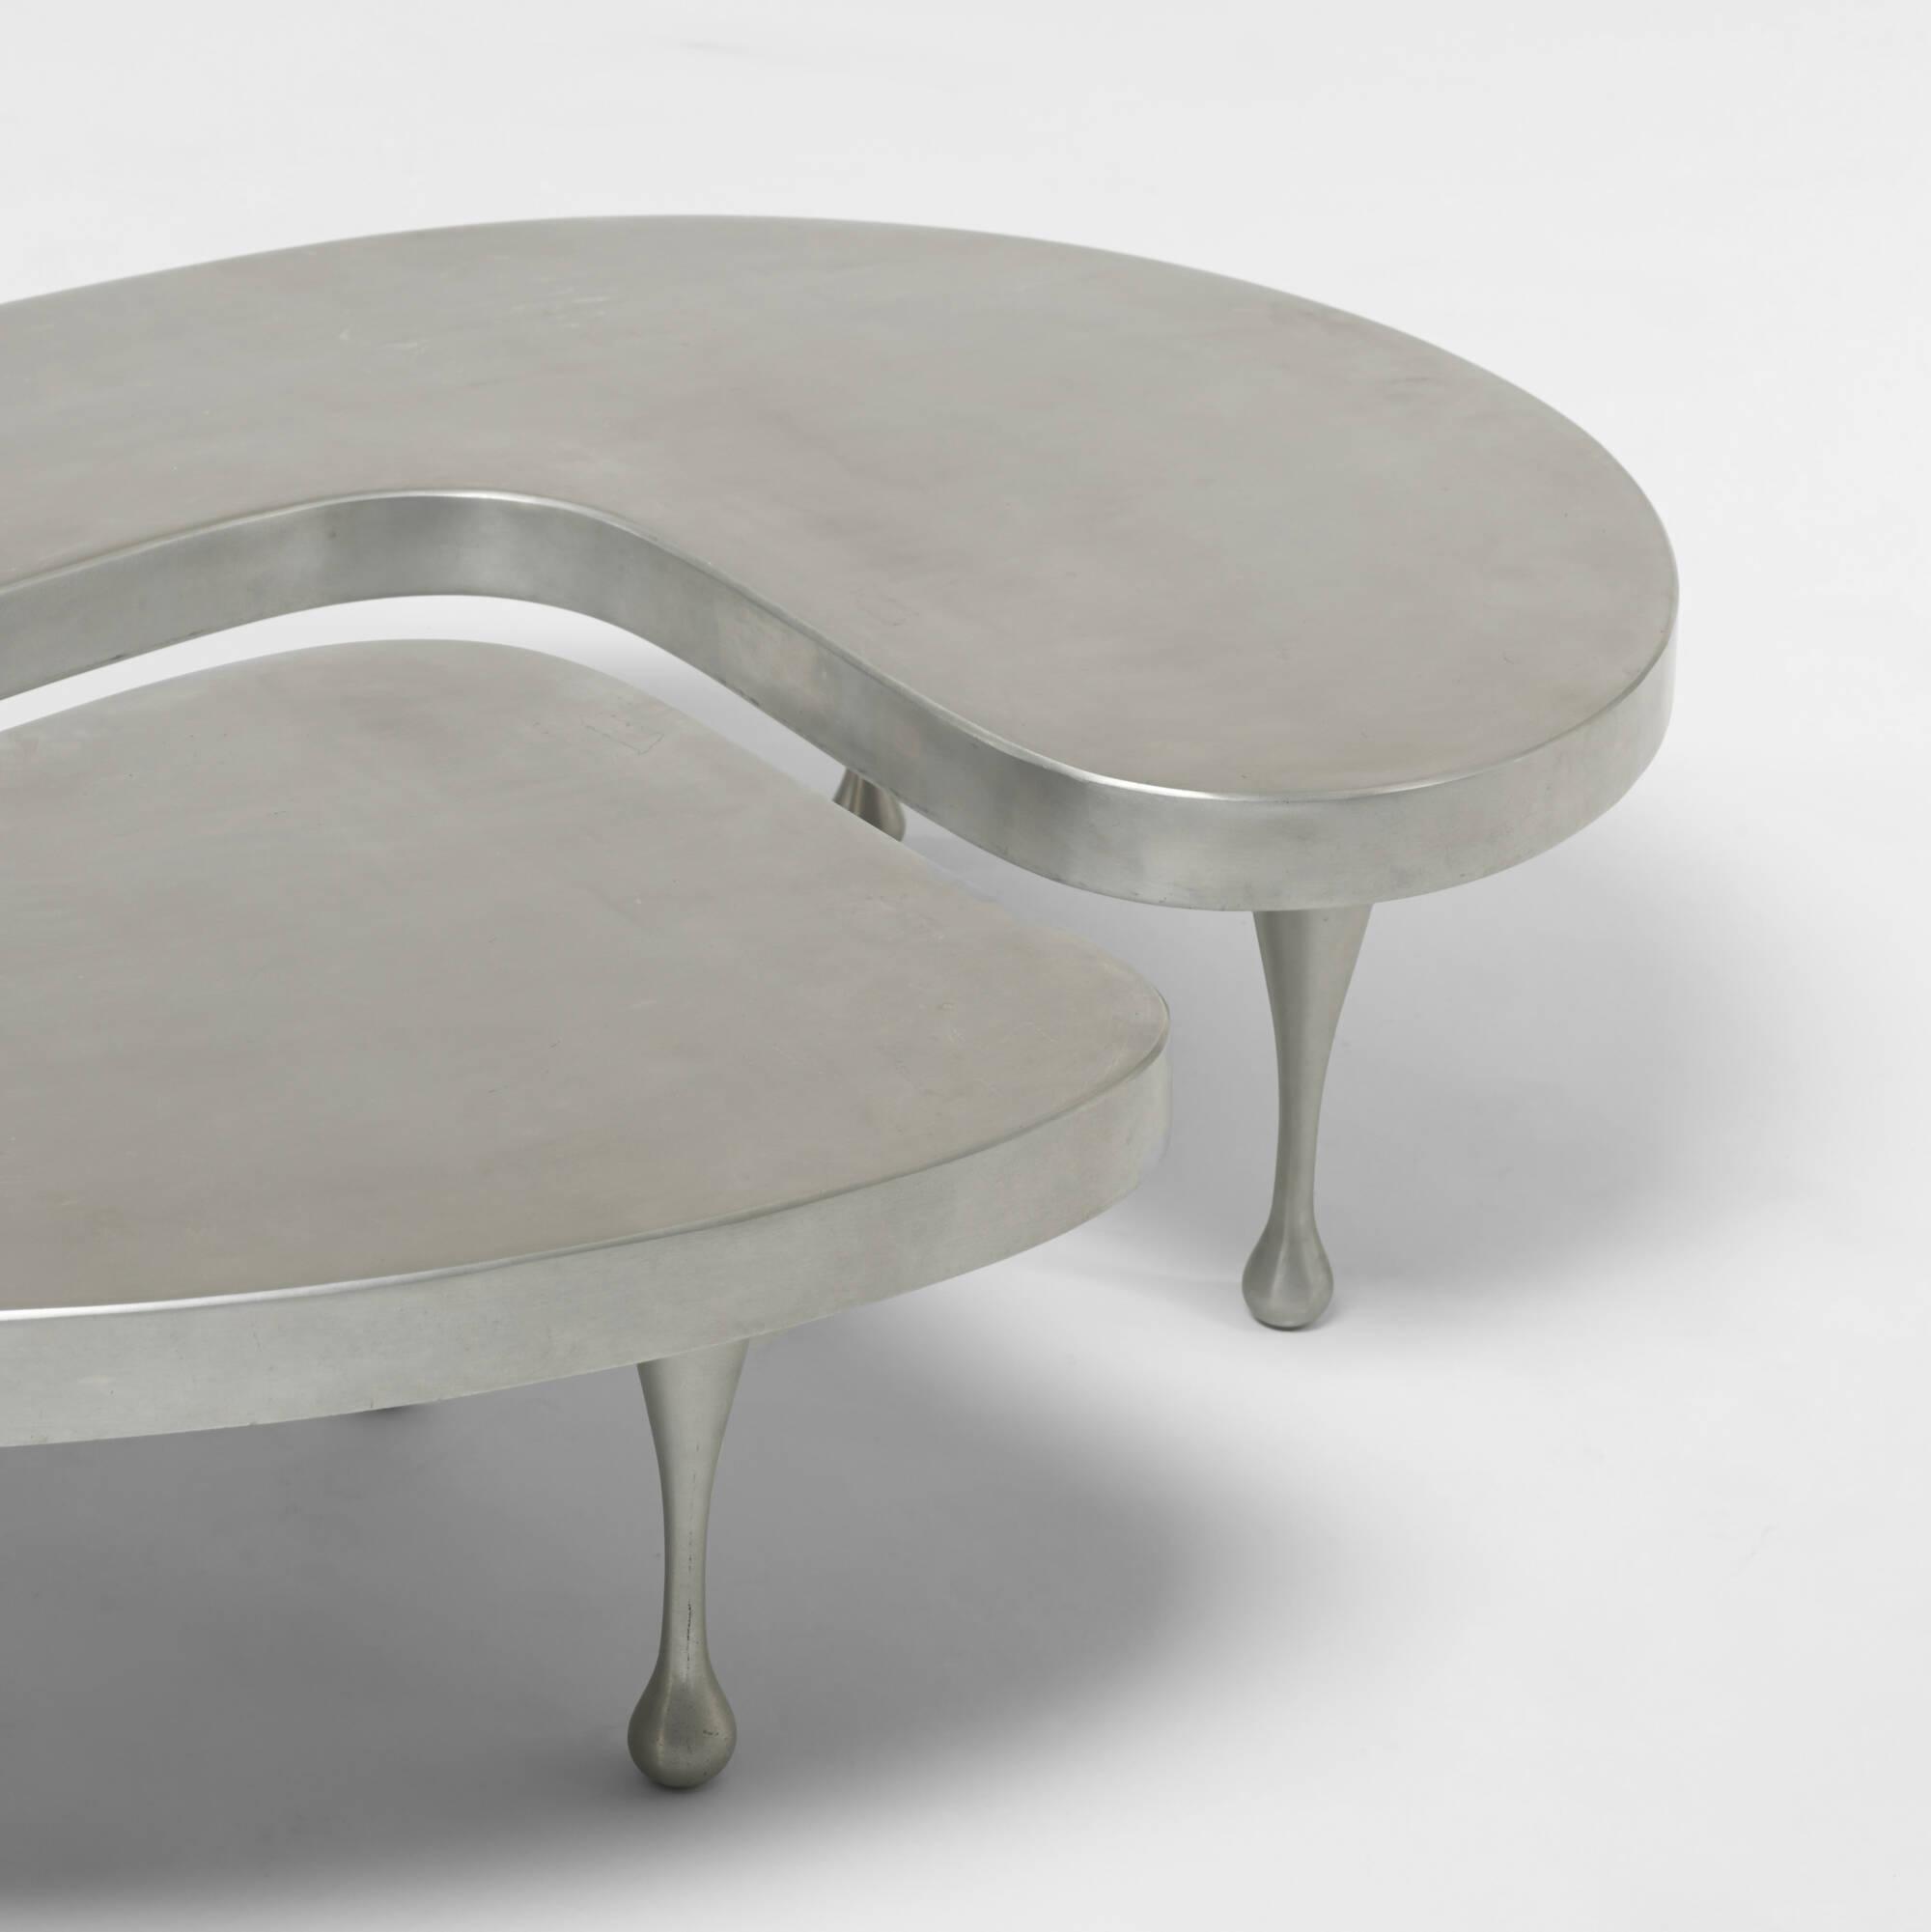 310: Frederick Kiesler / tables (7 of 7)